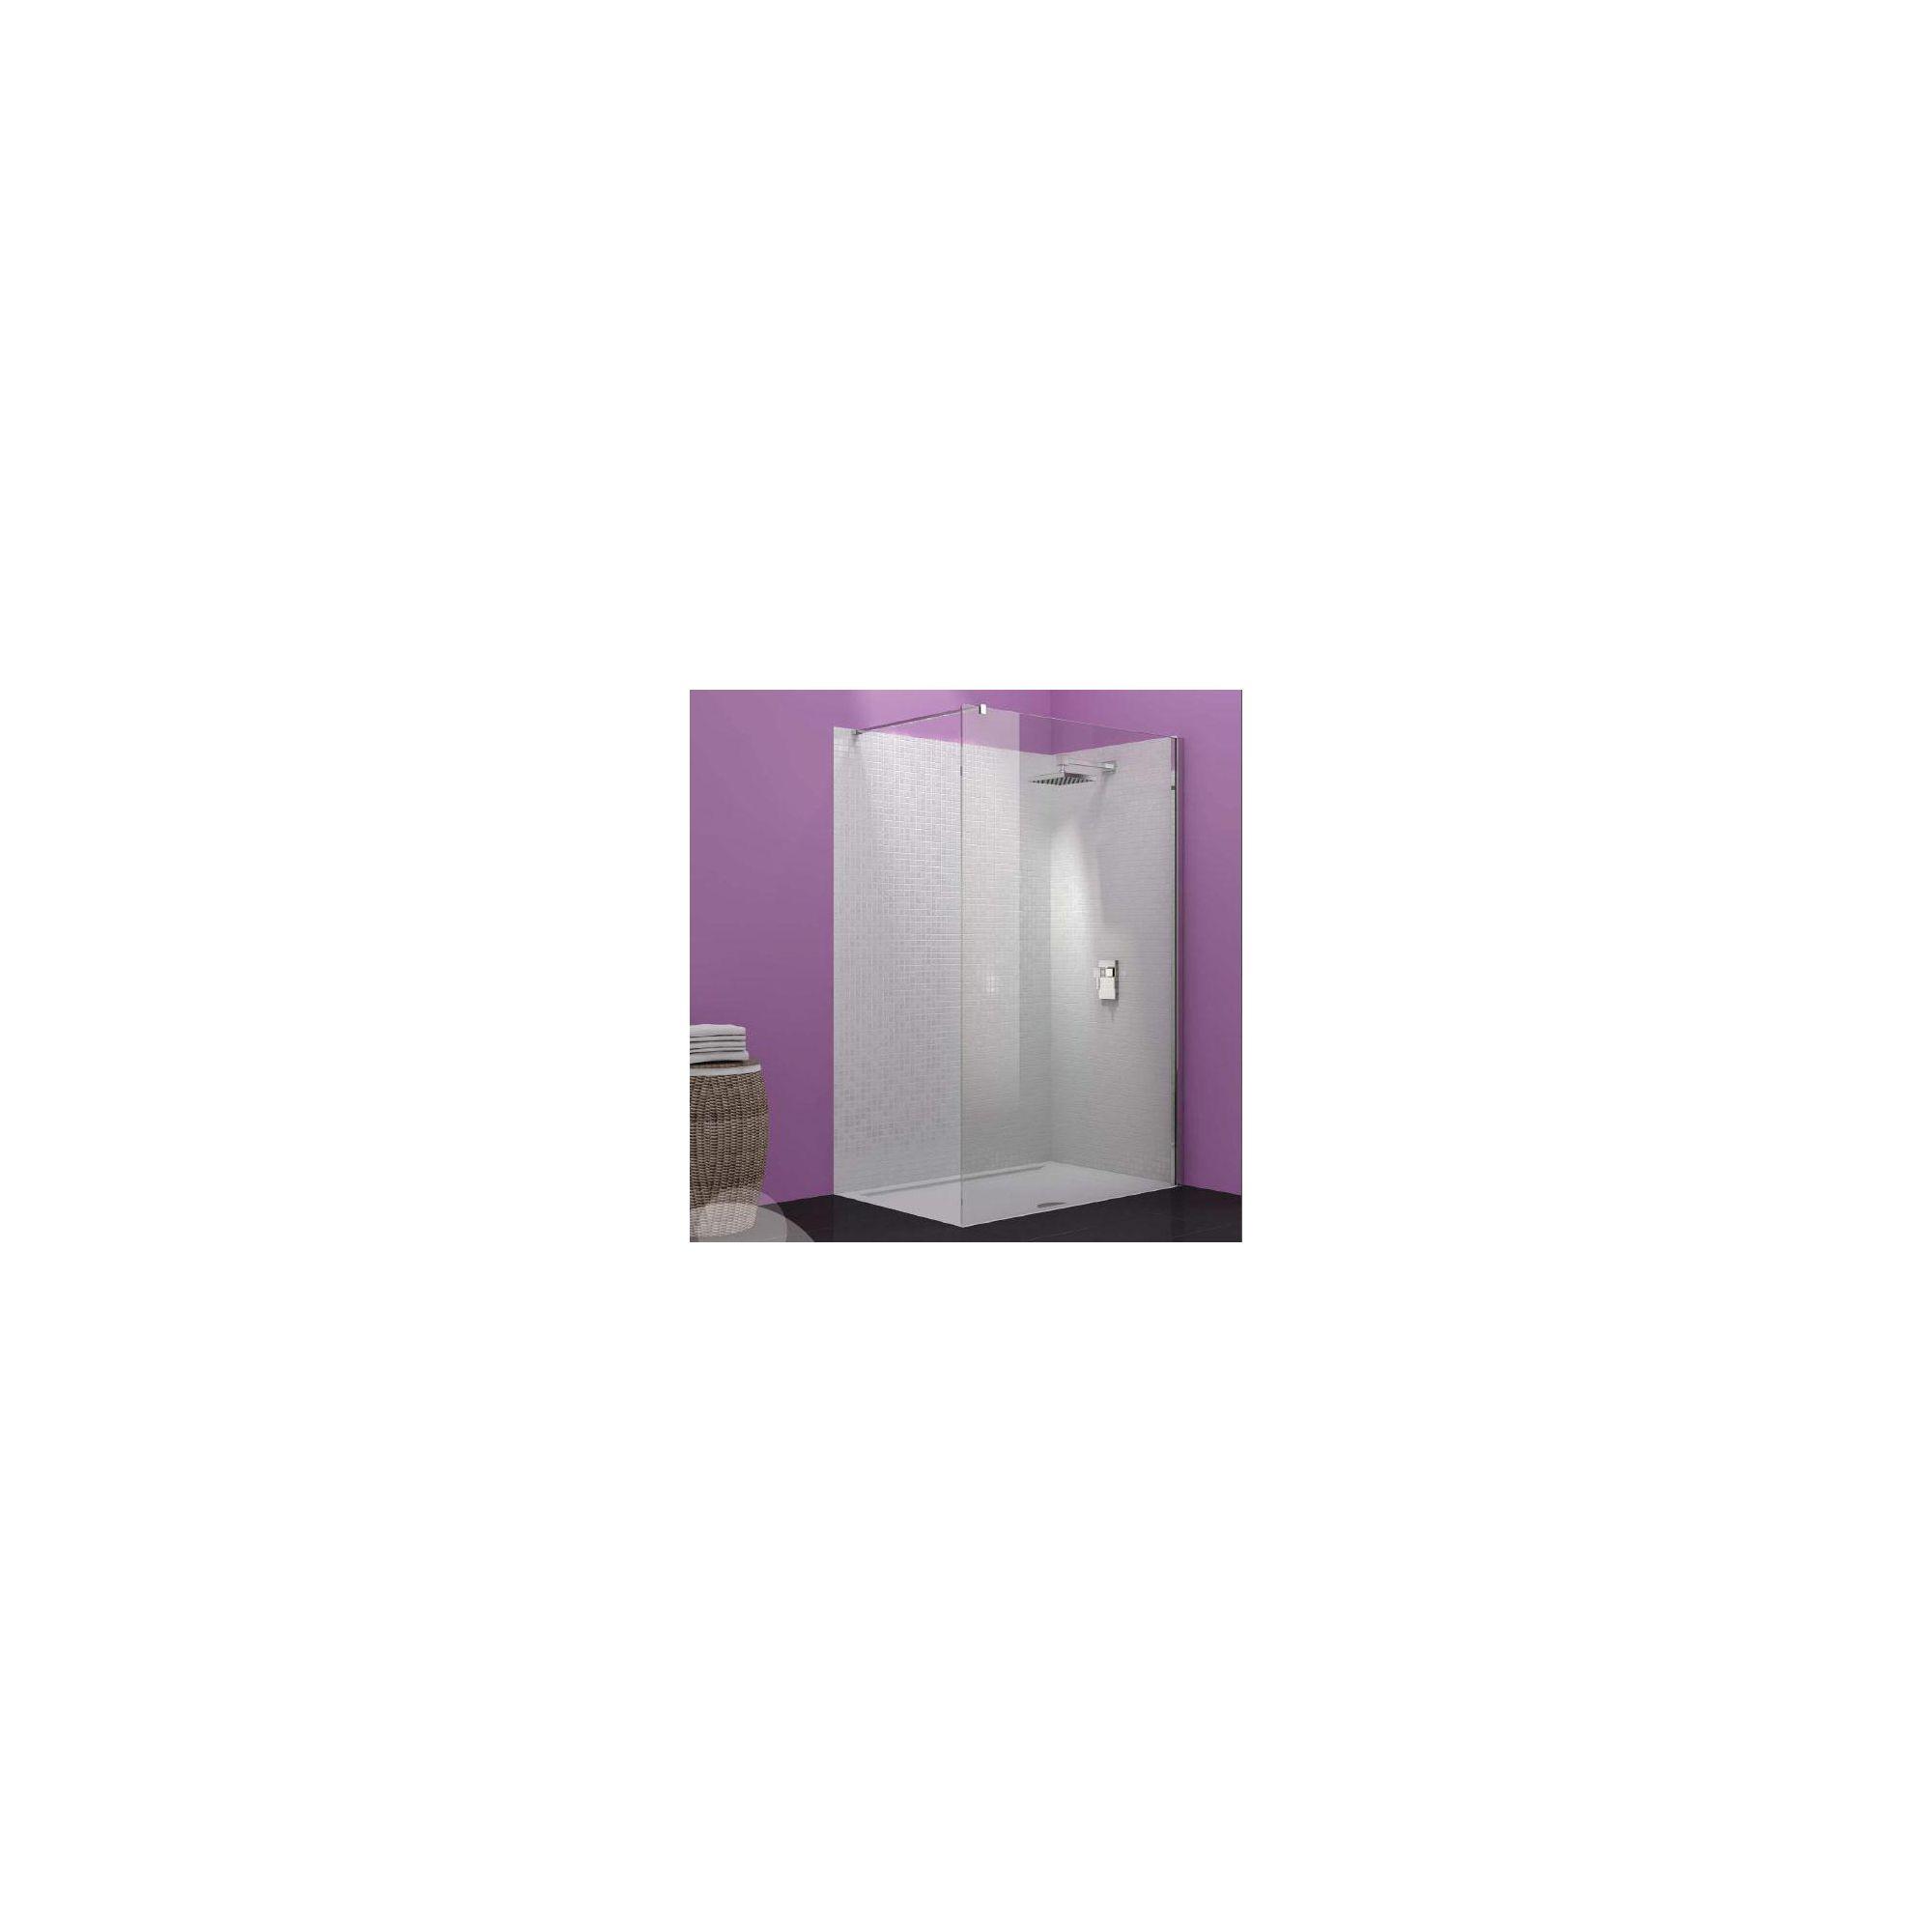 Merlyn Vivid Ten Wet Room Shower Glass Panel 900mm Wide at Tesco Direct